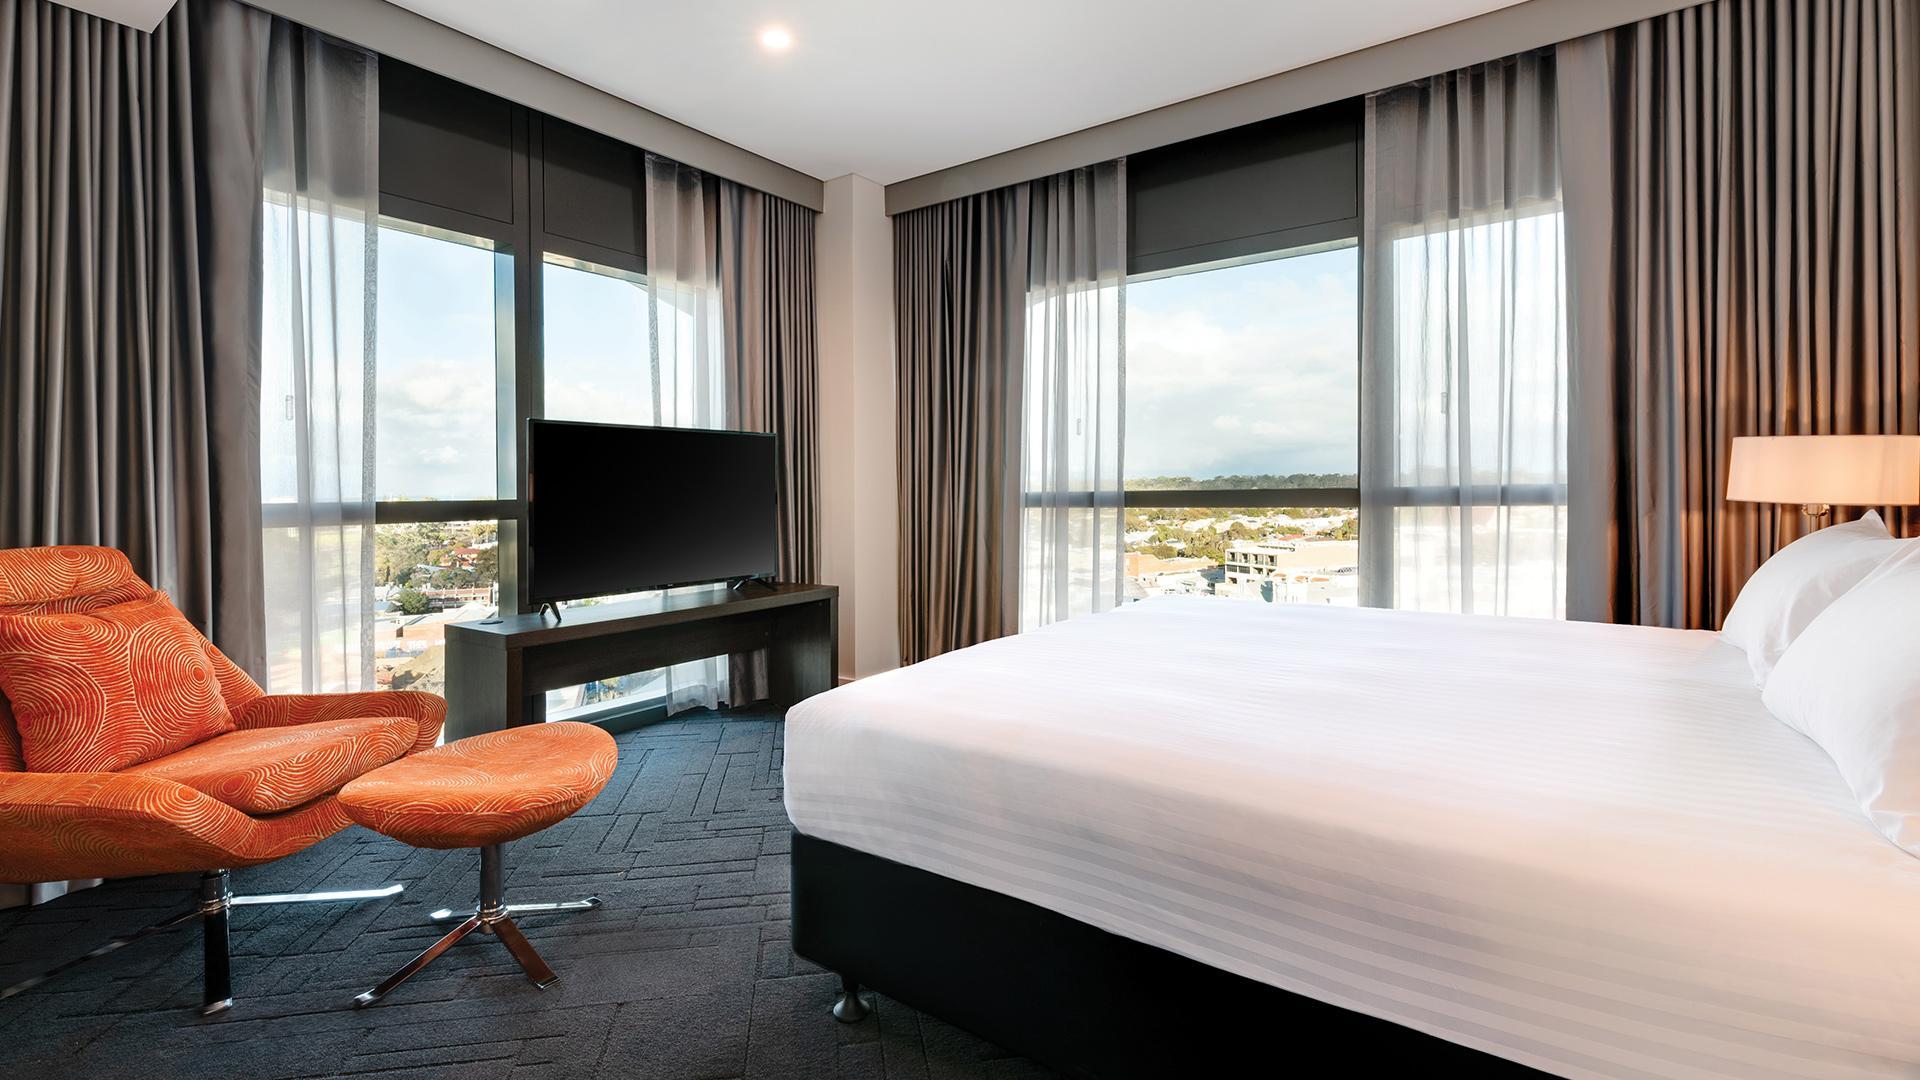 Premier Suite image 1 at Vibe Hotel Subiaco Perth by City of Subiaco, Western Australia, Australia